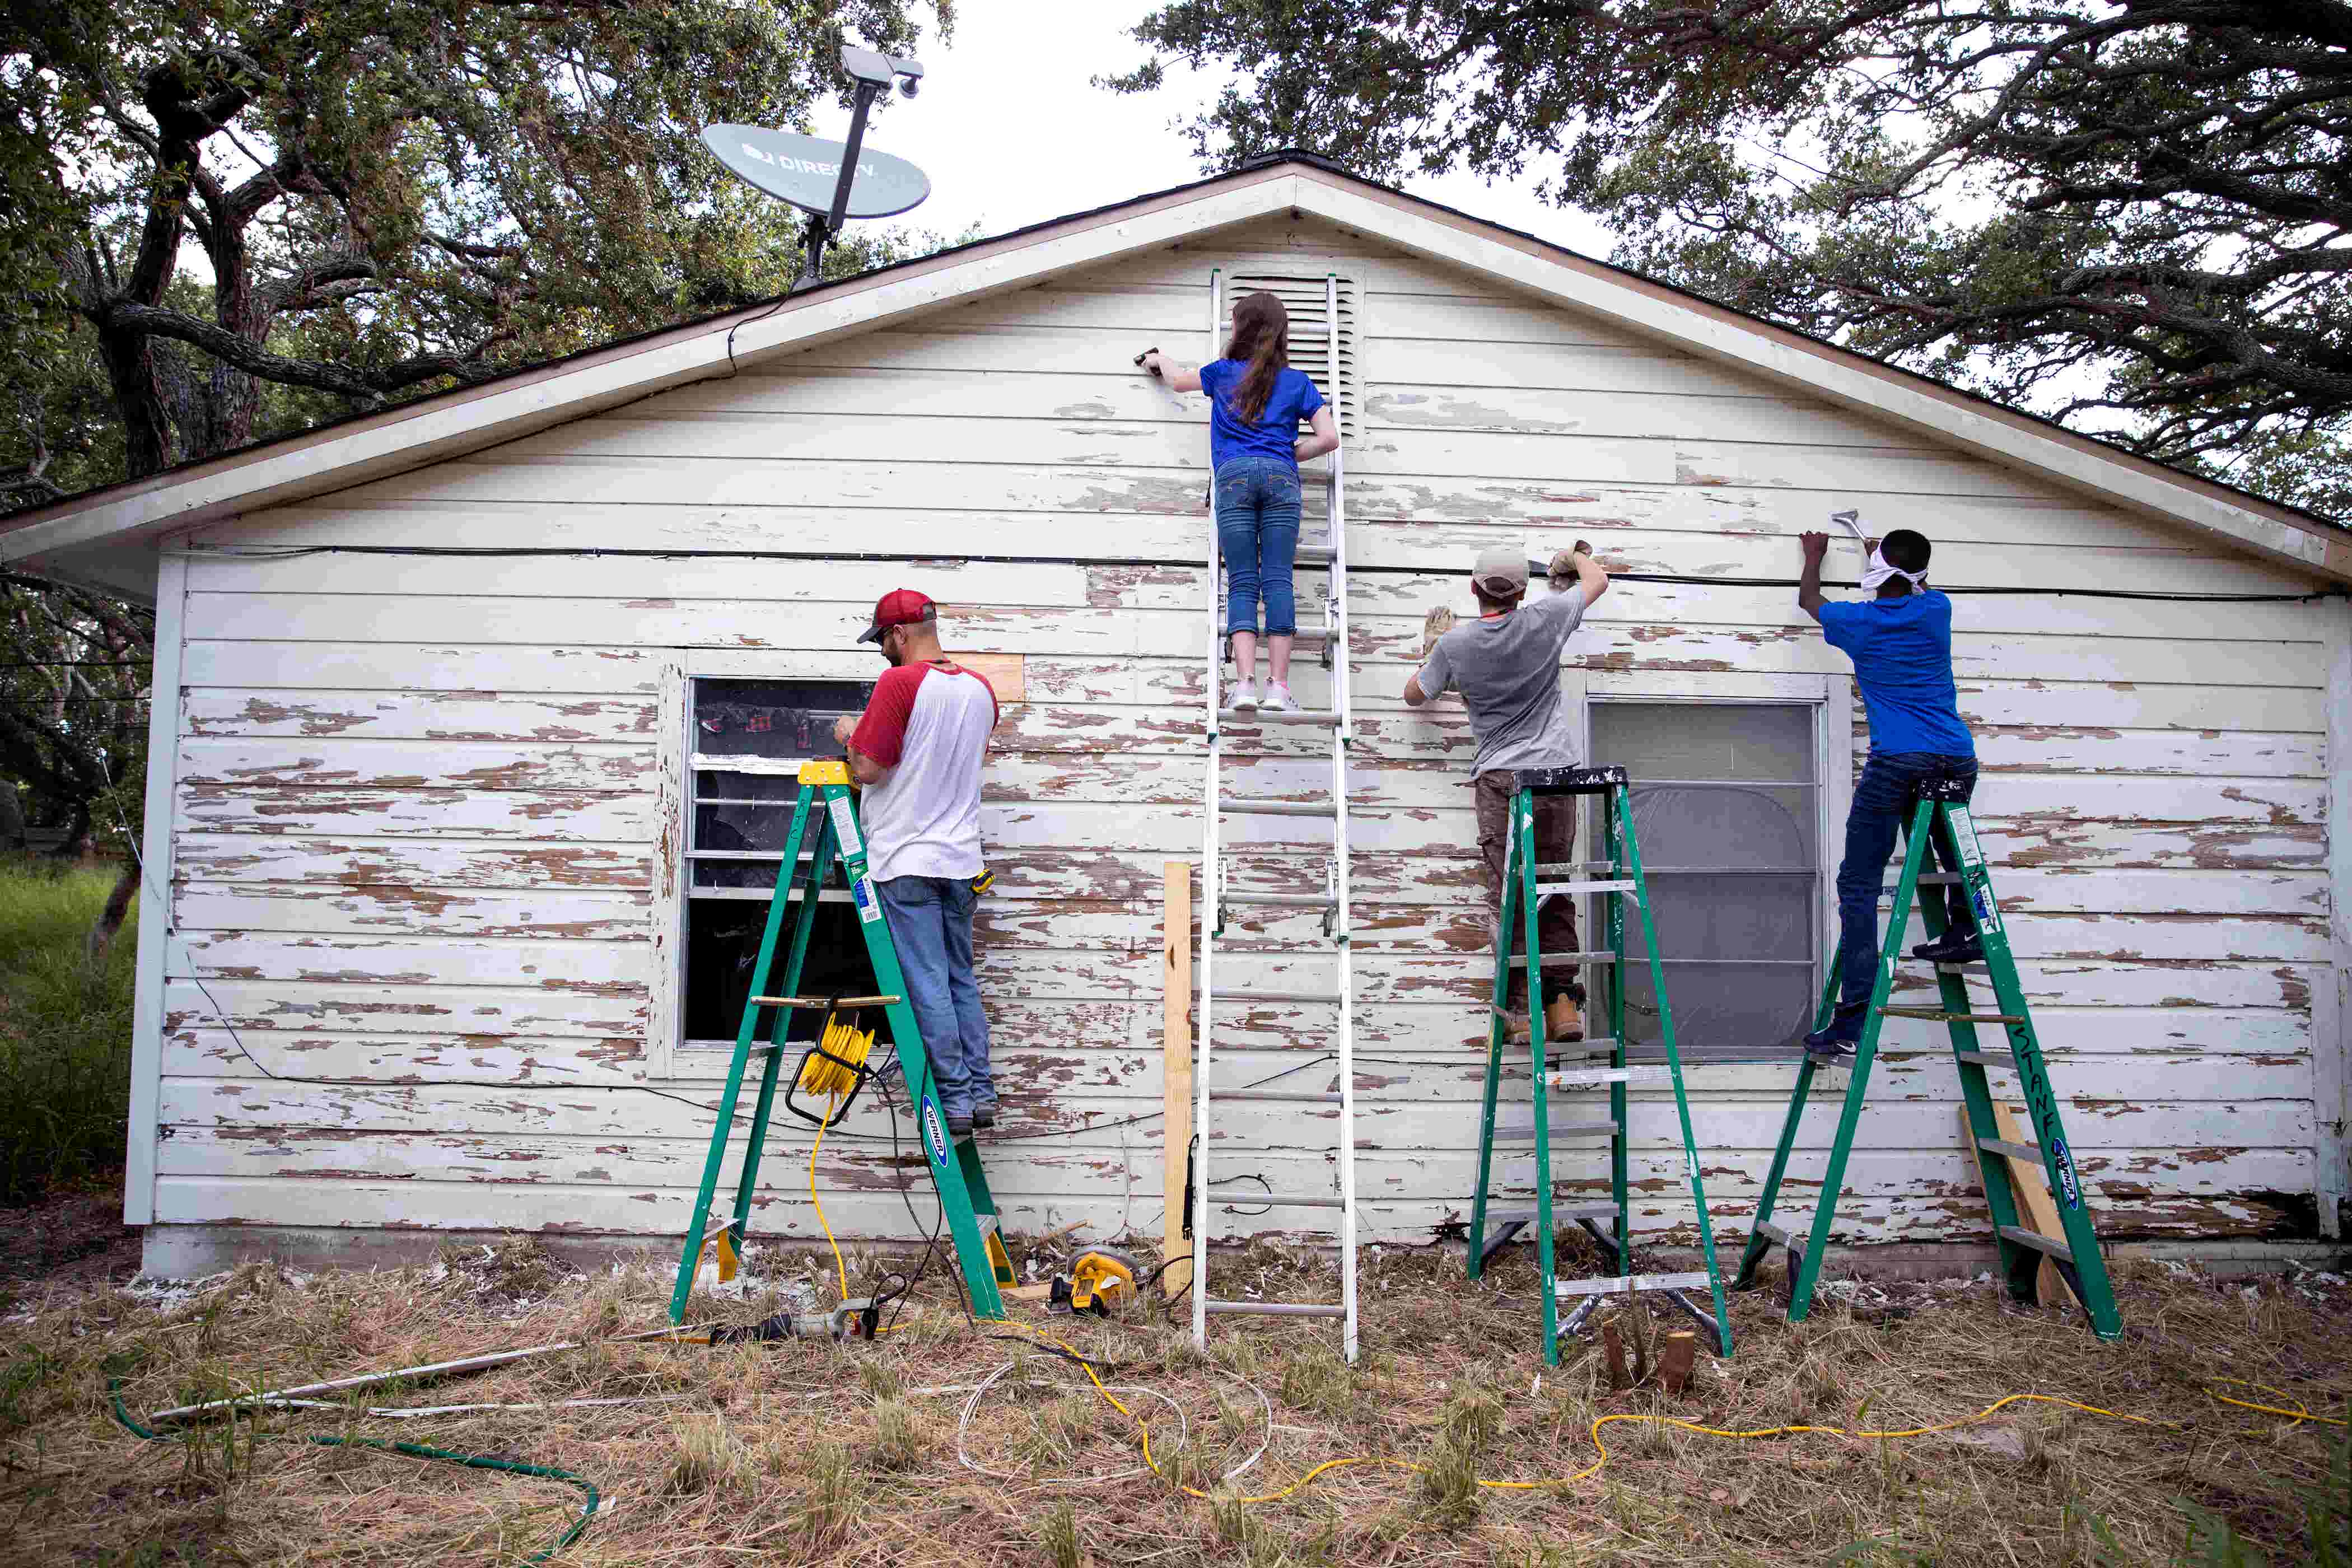 120 Texas students spend week helping in Hurricane Harvey recovery efforts